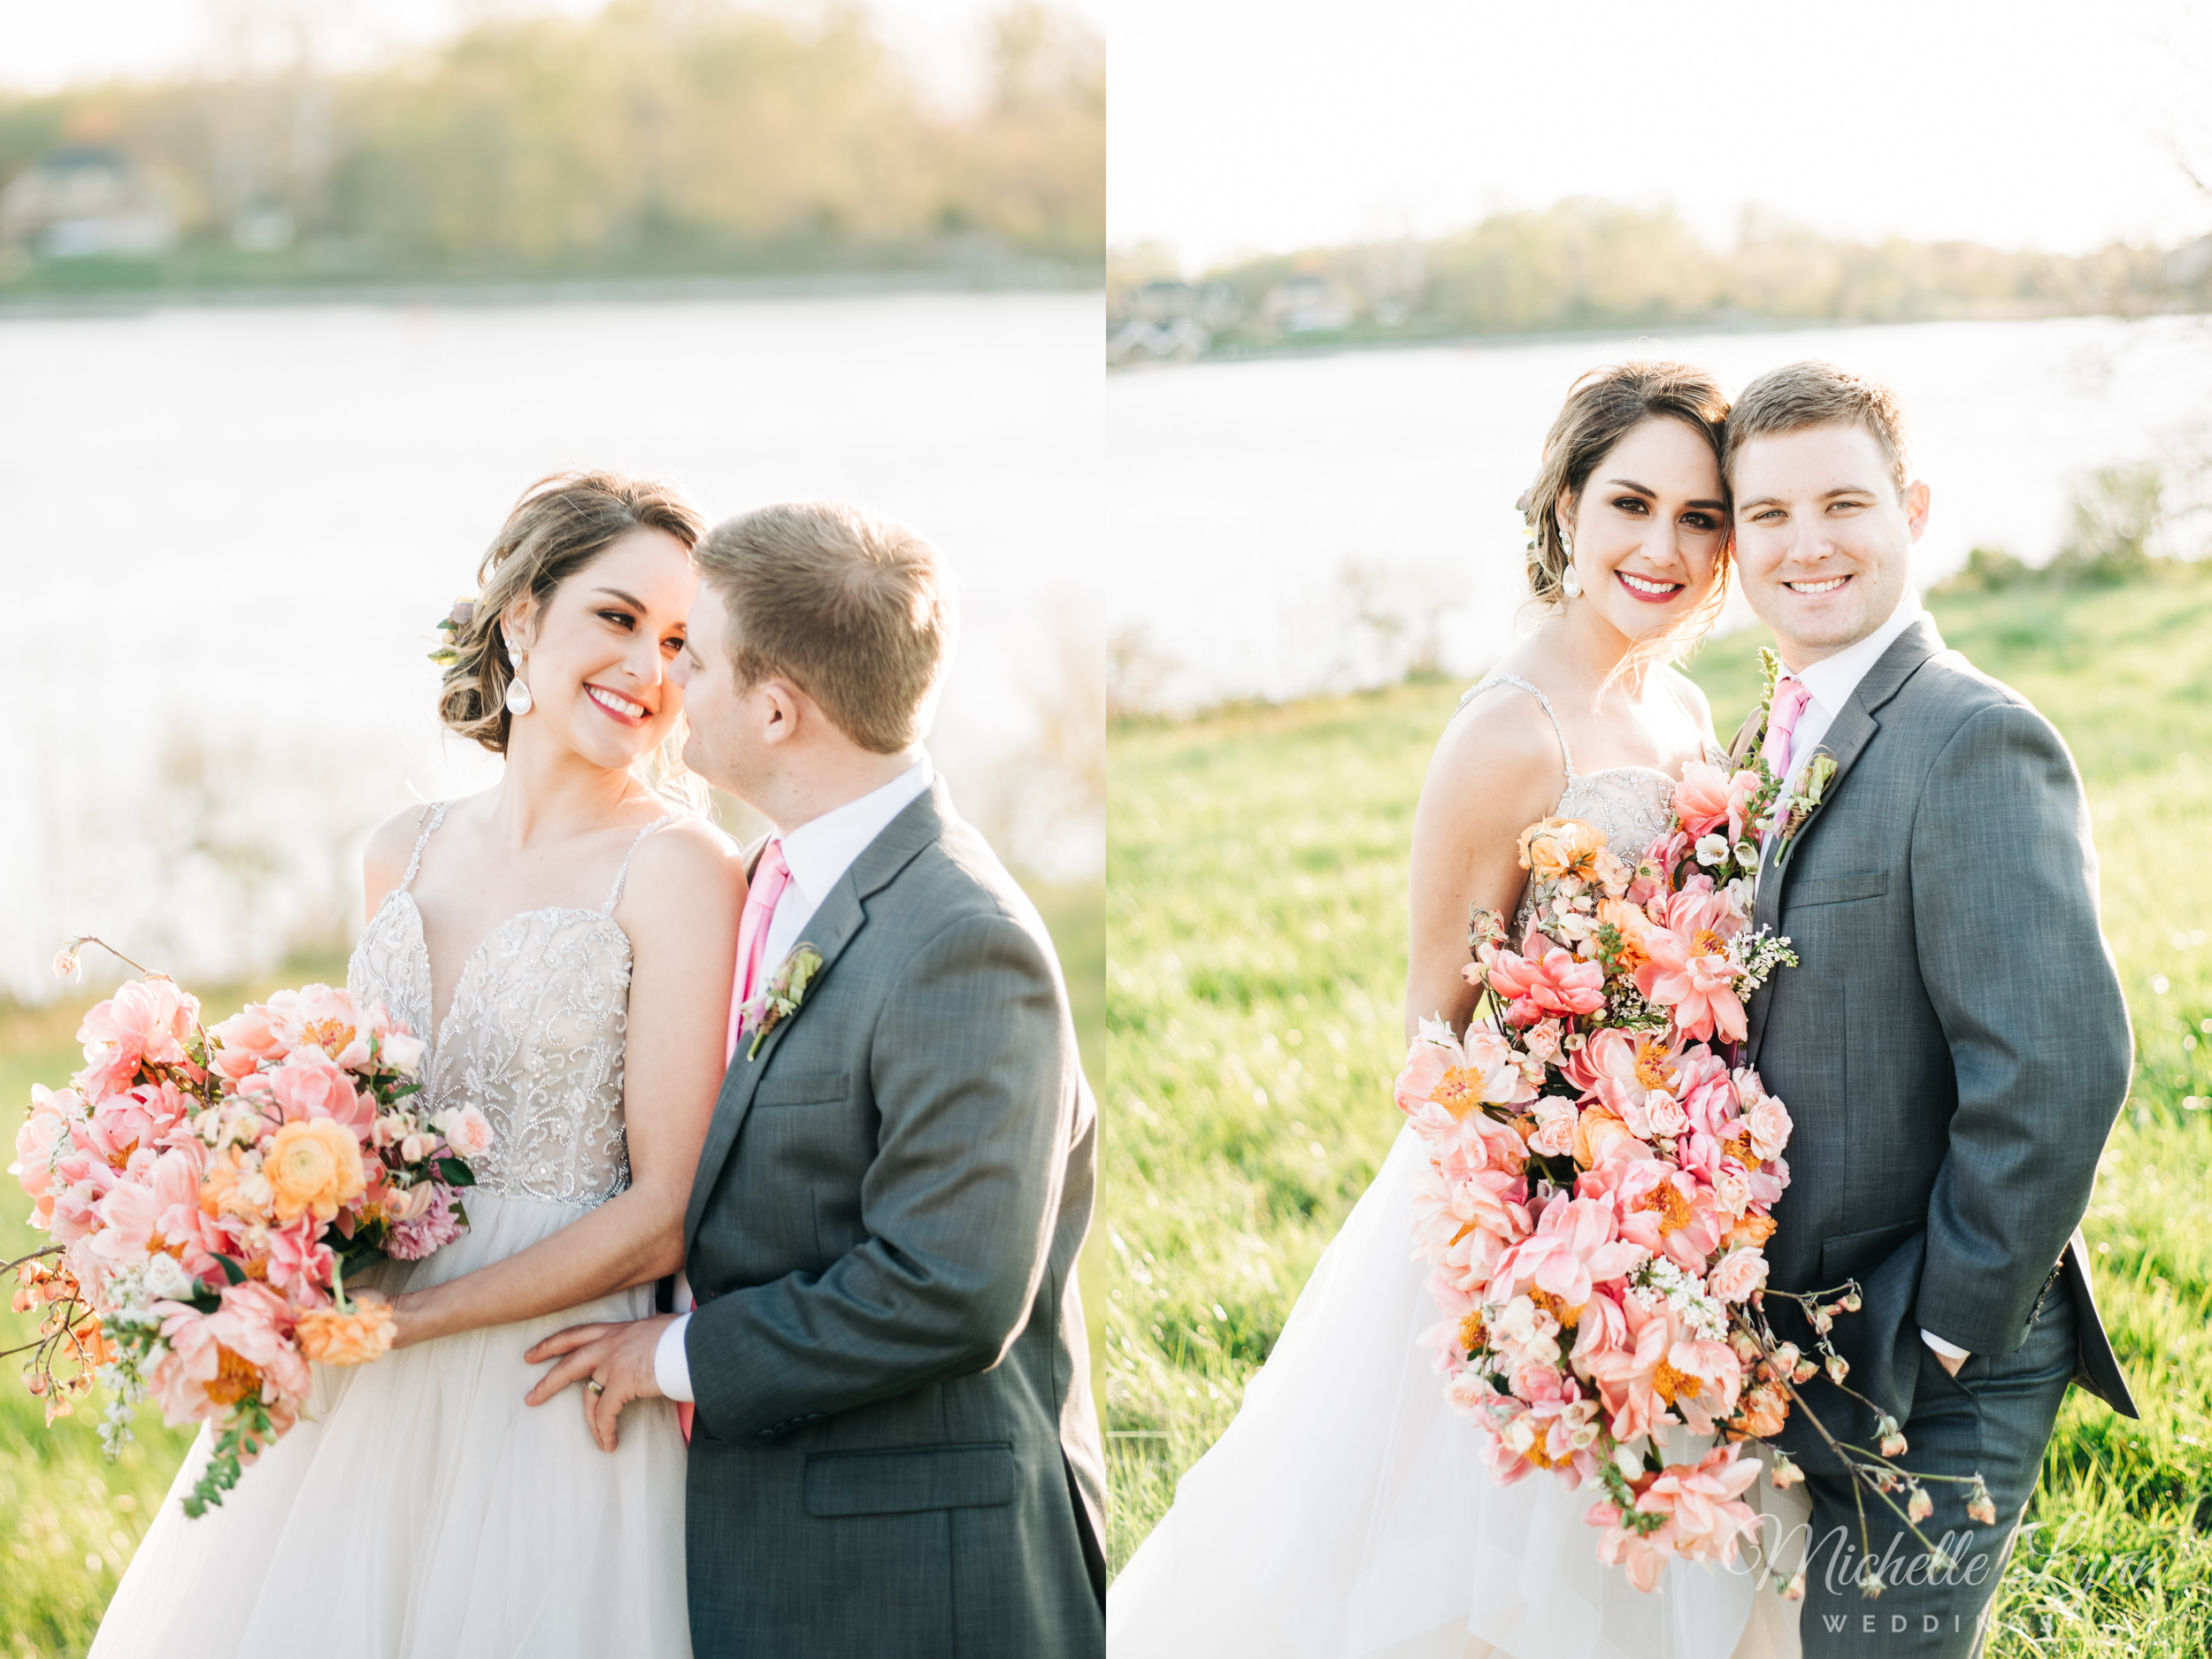 mlw-whitehall-annapolis-maryland-wedding-39.jpg